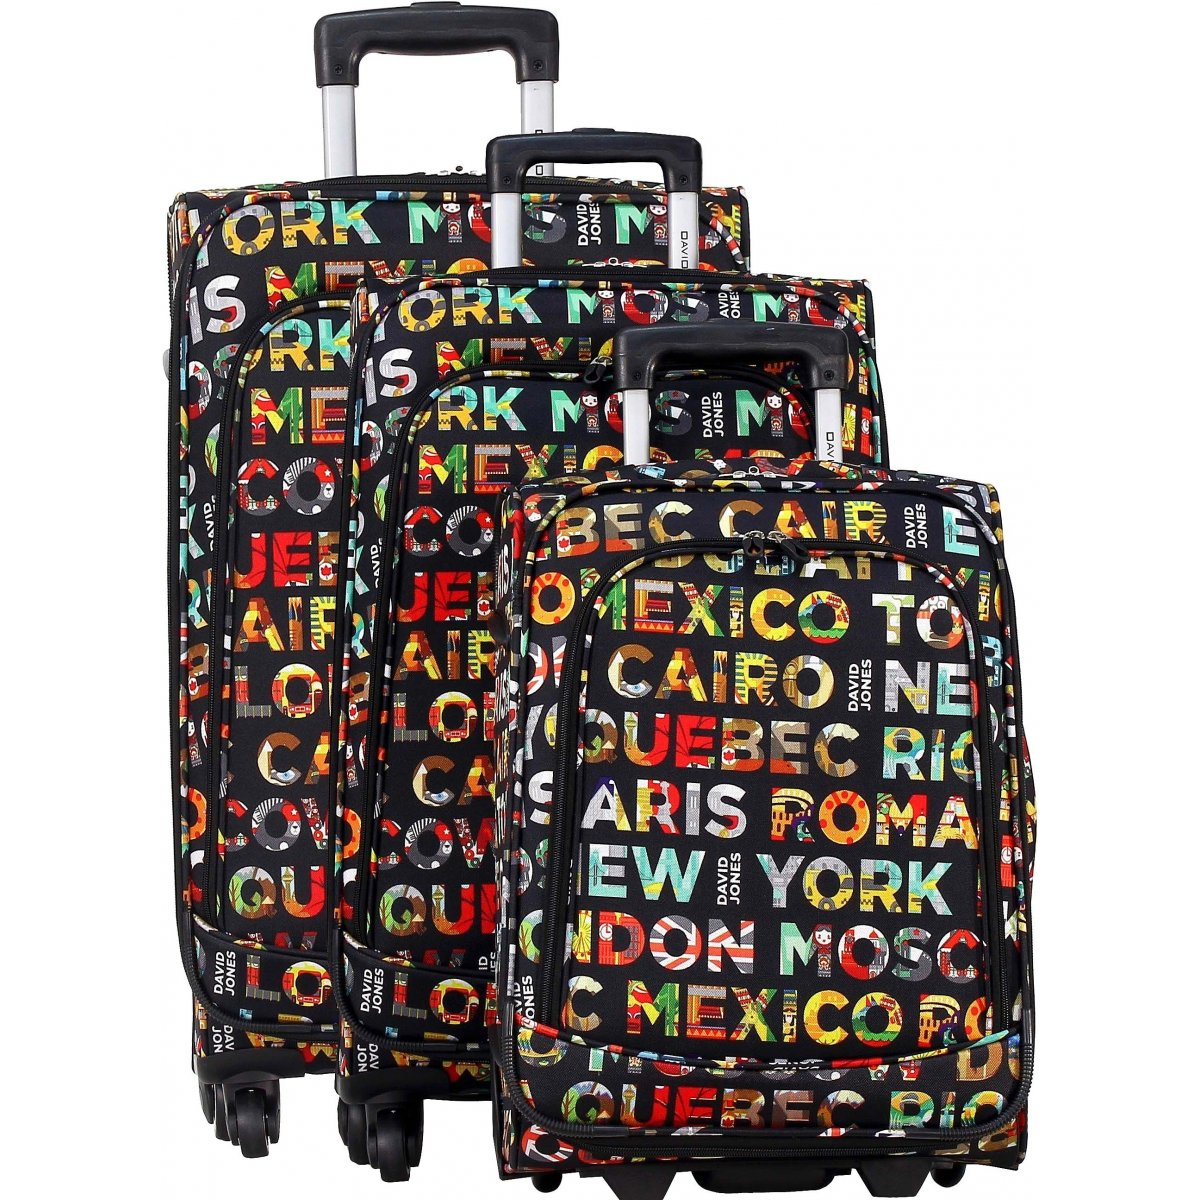 lot 3 valises dont 1 cabine ryanair david jones r20003 couleur principale lettres. Black Bedroom Furniture Sets. Home Design Ideas